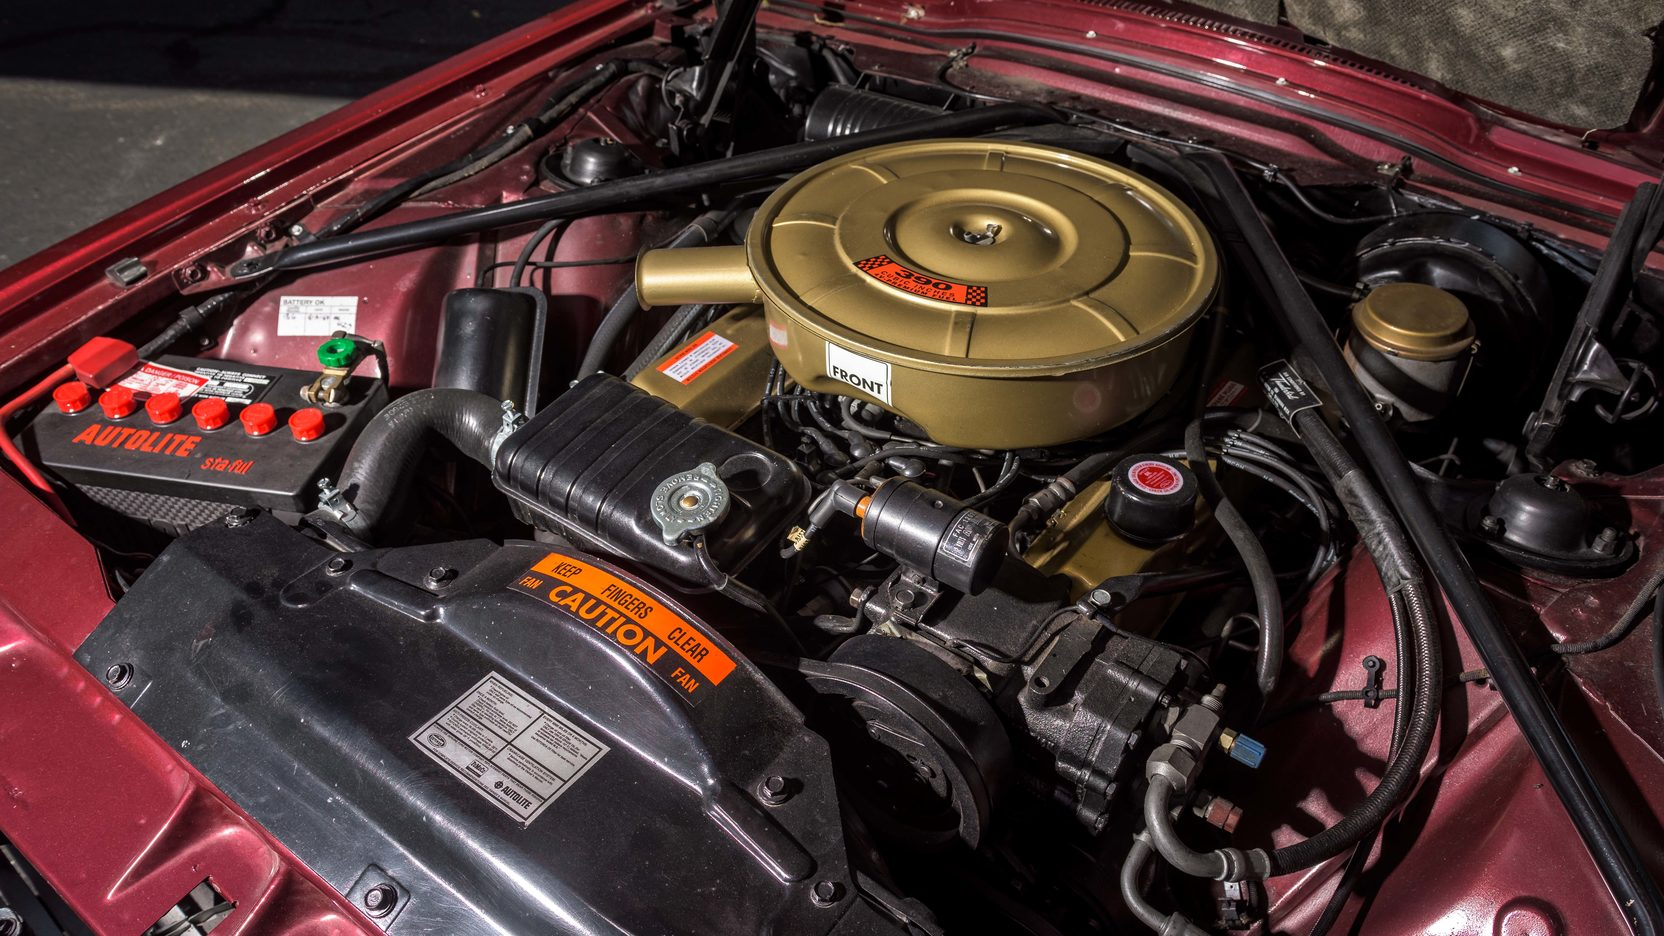 1965 Ford Thunderbird engine